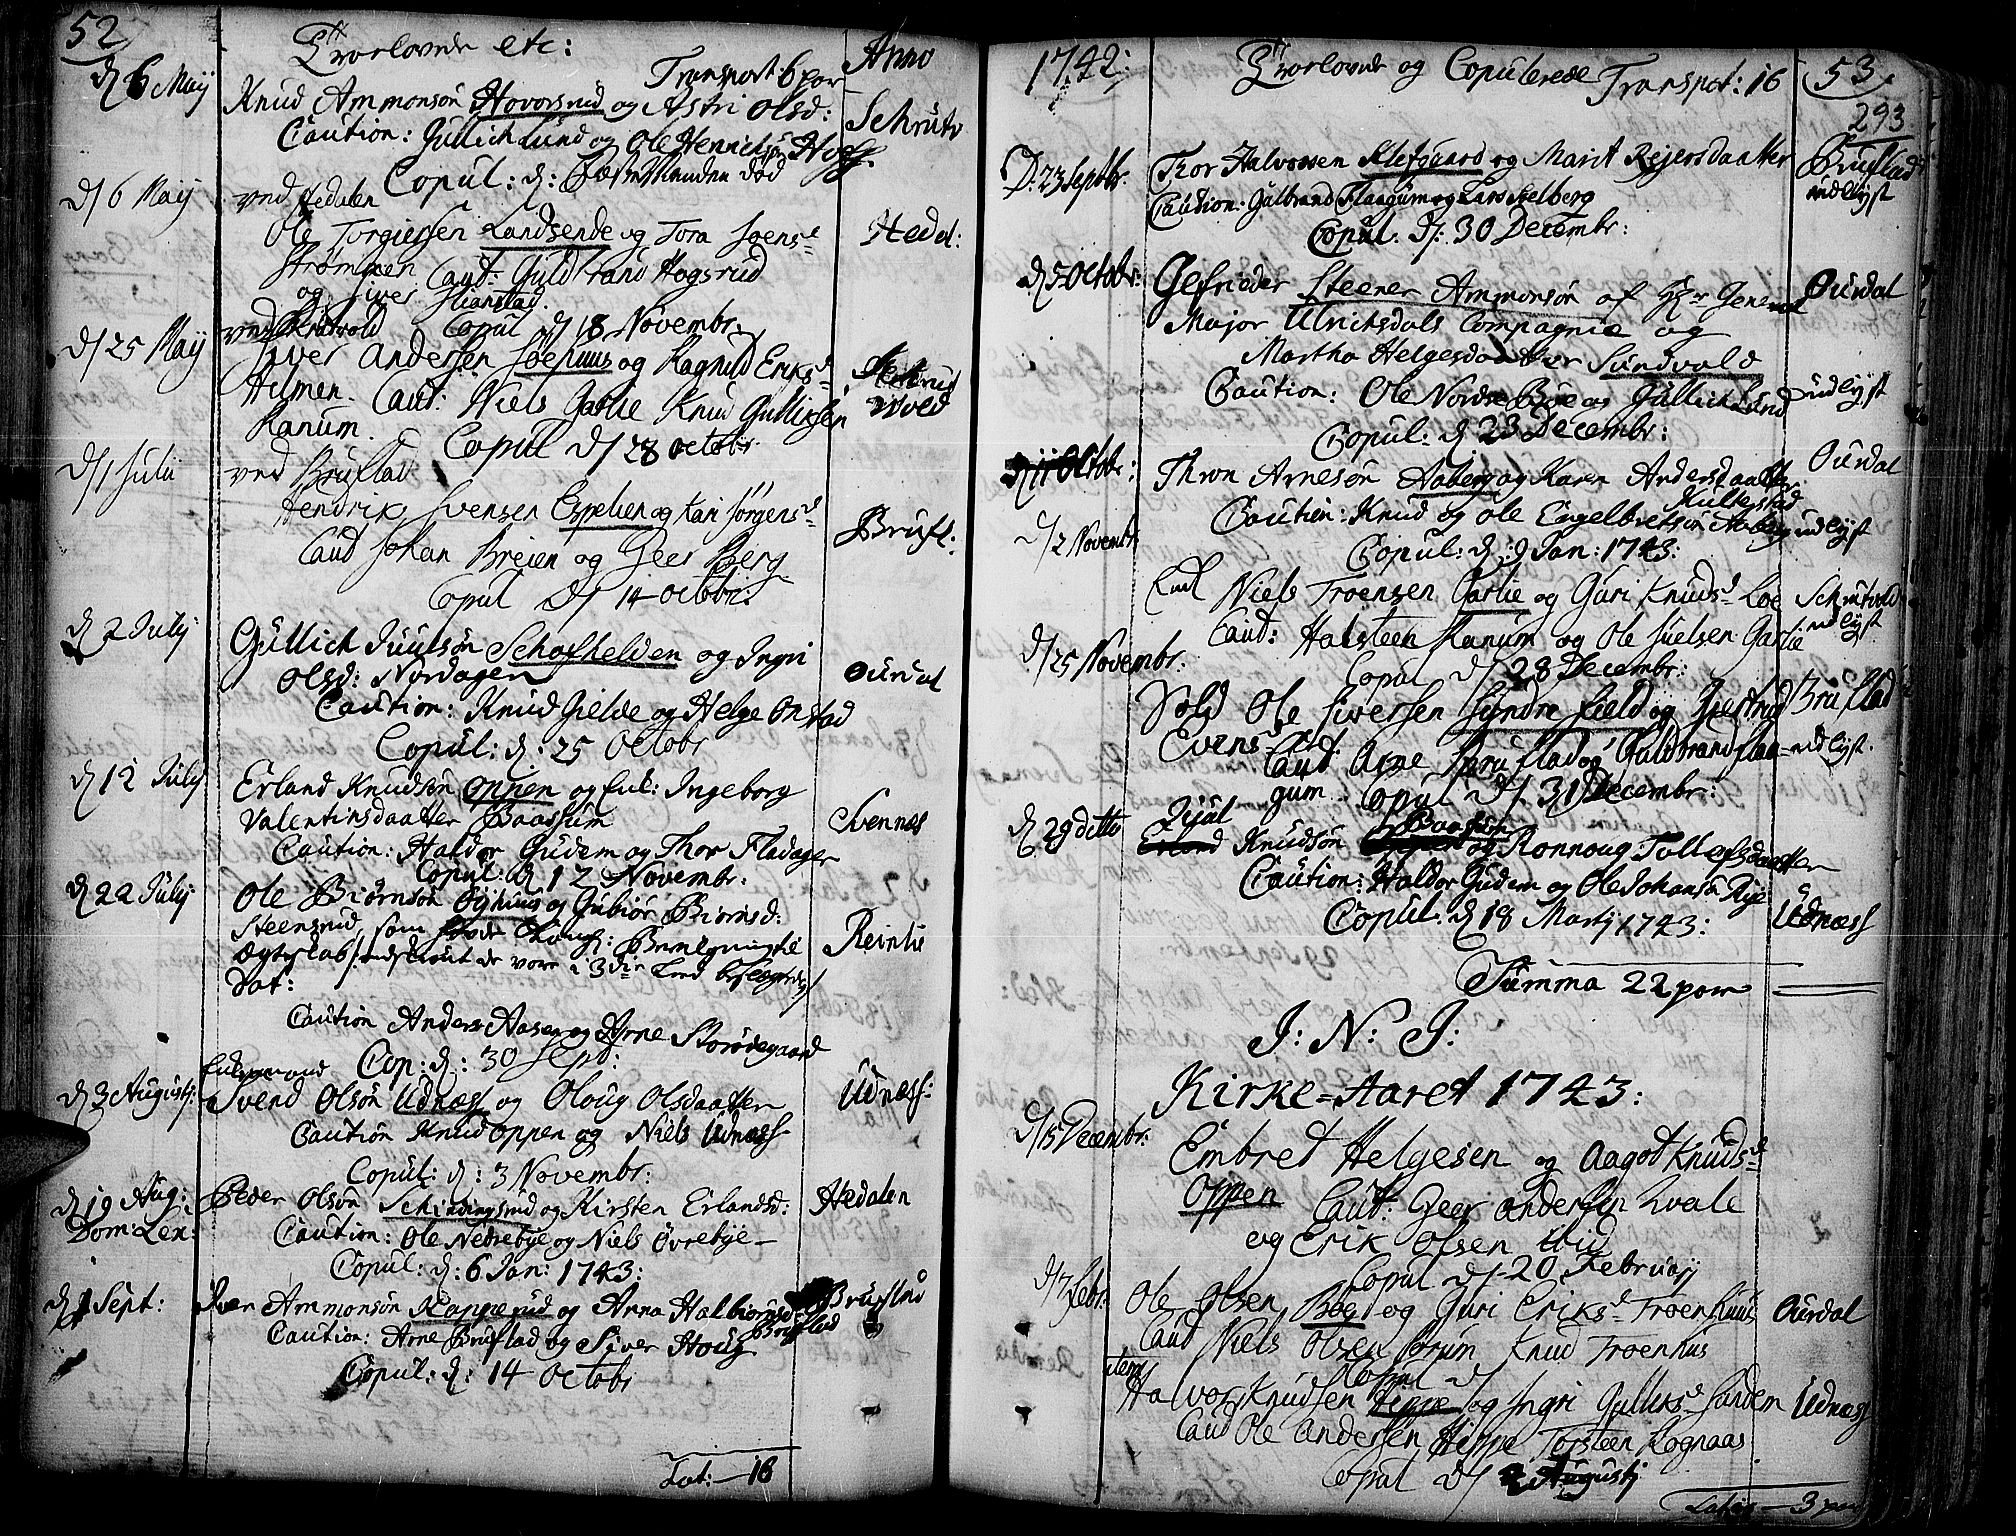 SAH, Aurdal prestekontor, Ministerialbok nr. 4, 1730-1762, s. 52-53